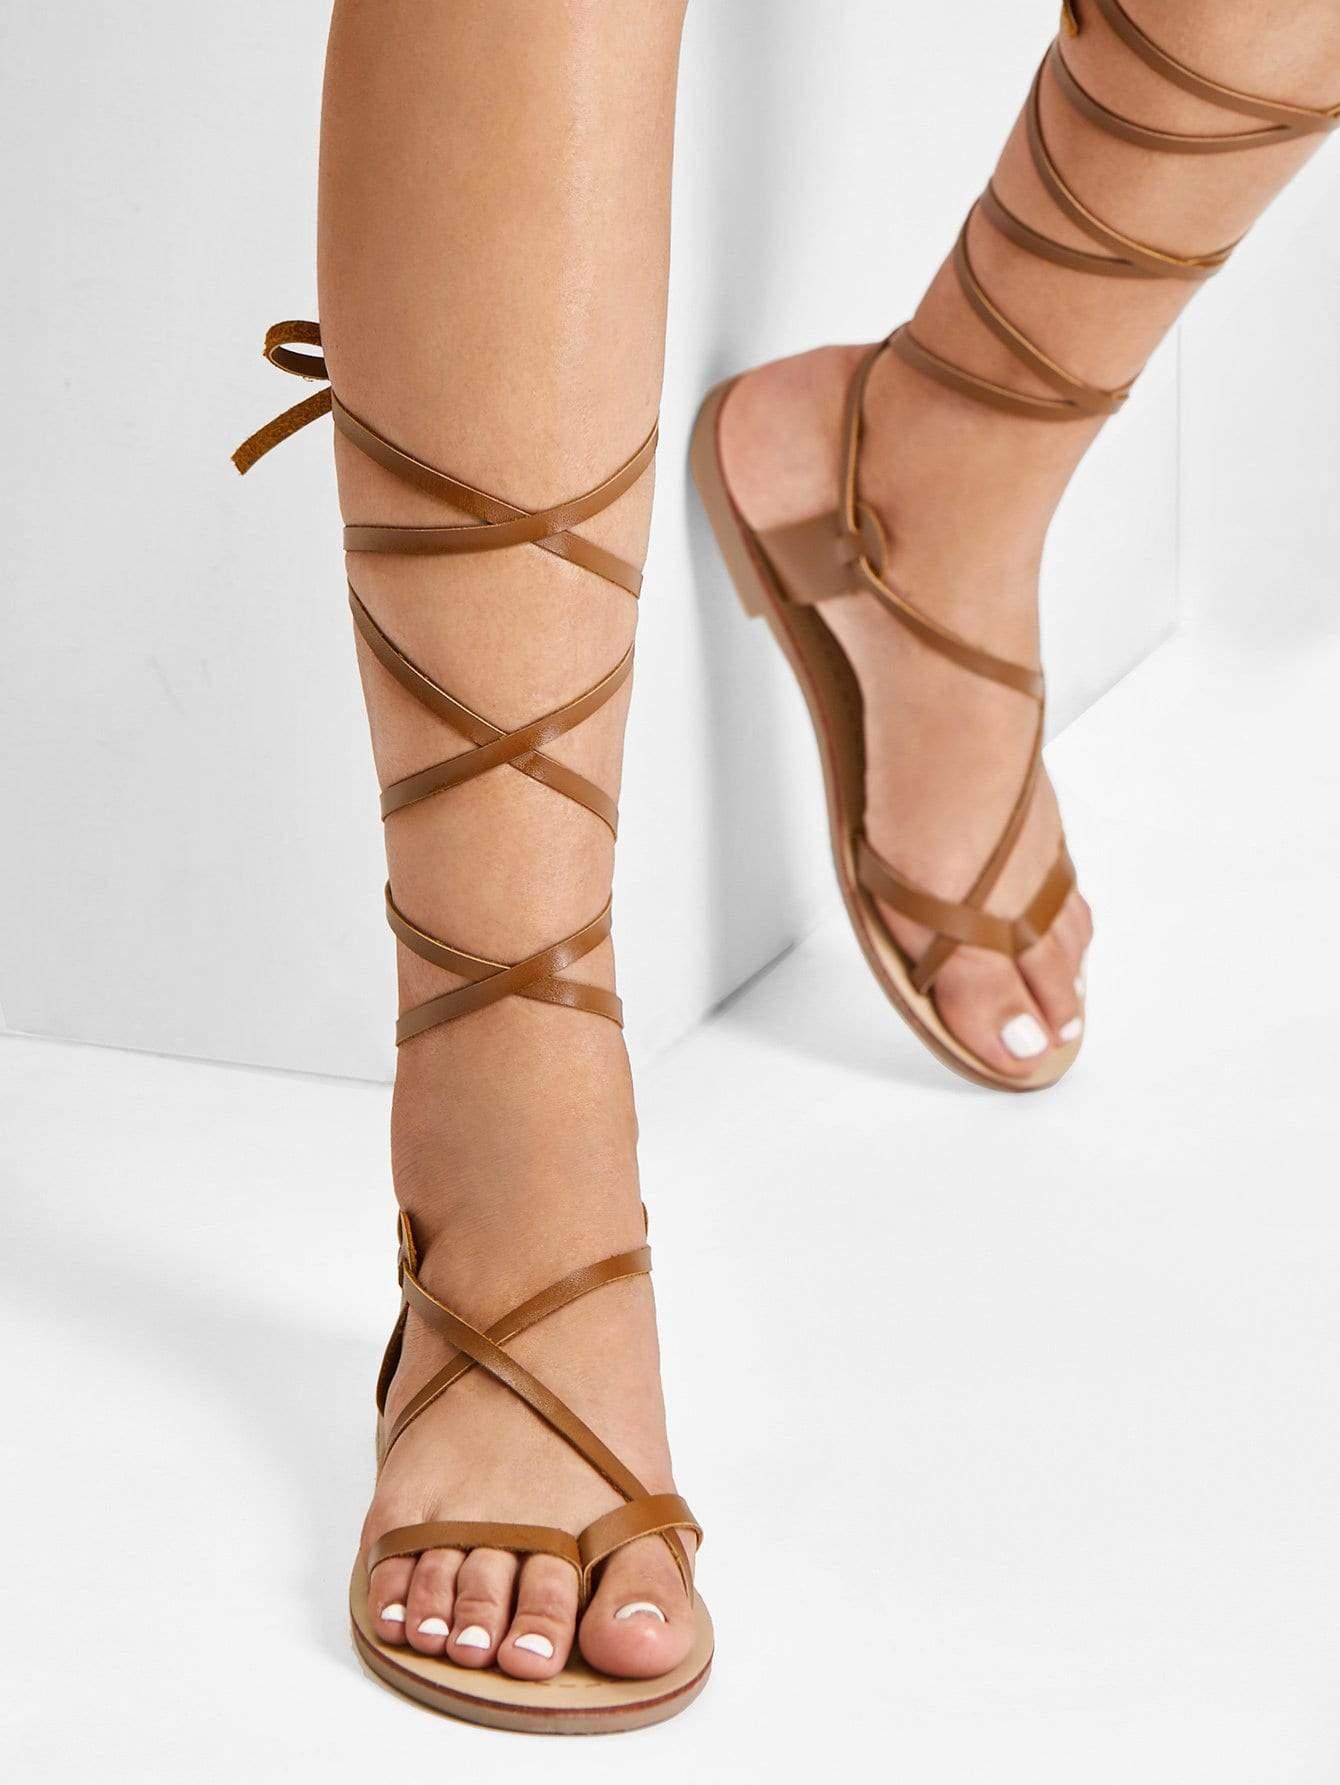 gladiator sandal boots. #sandals #shoes